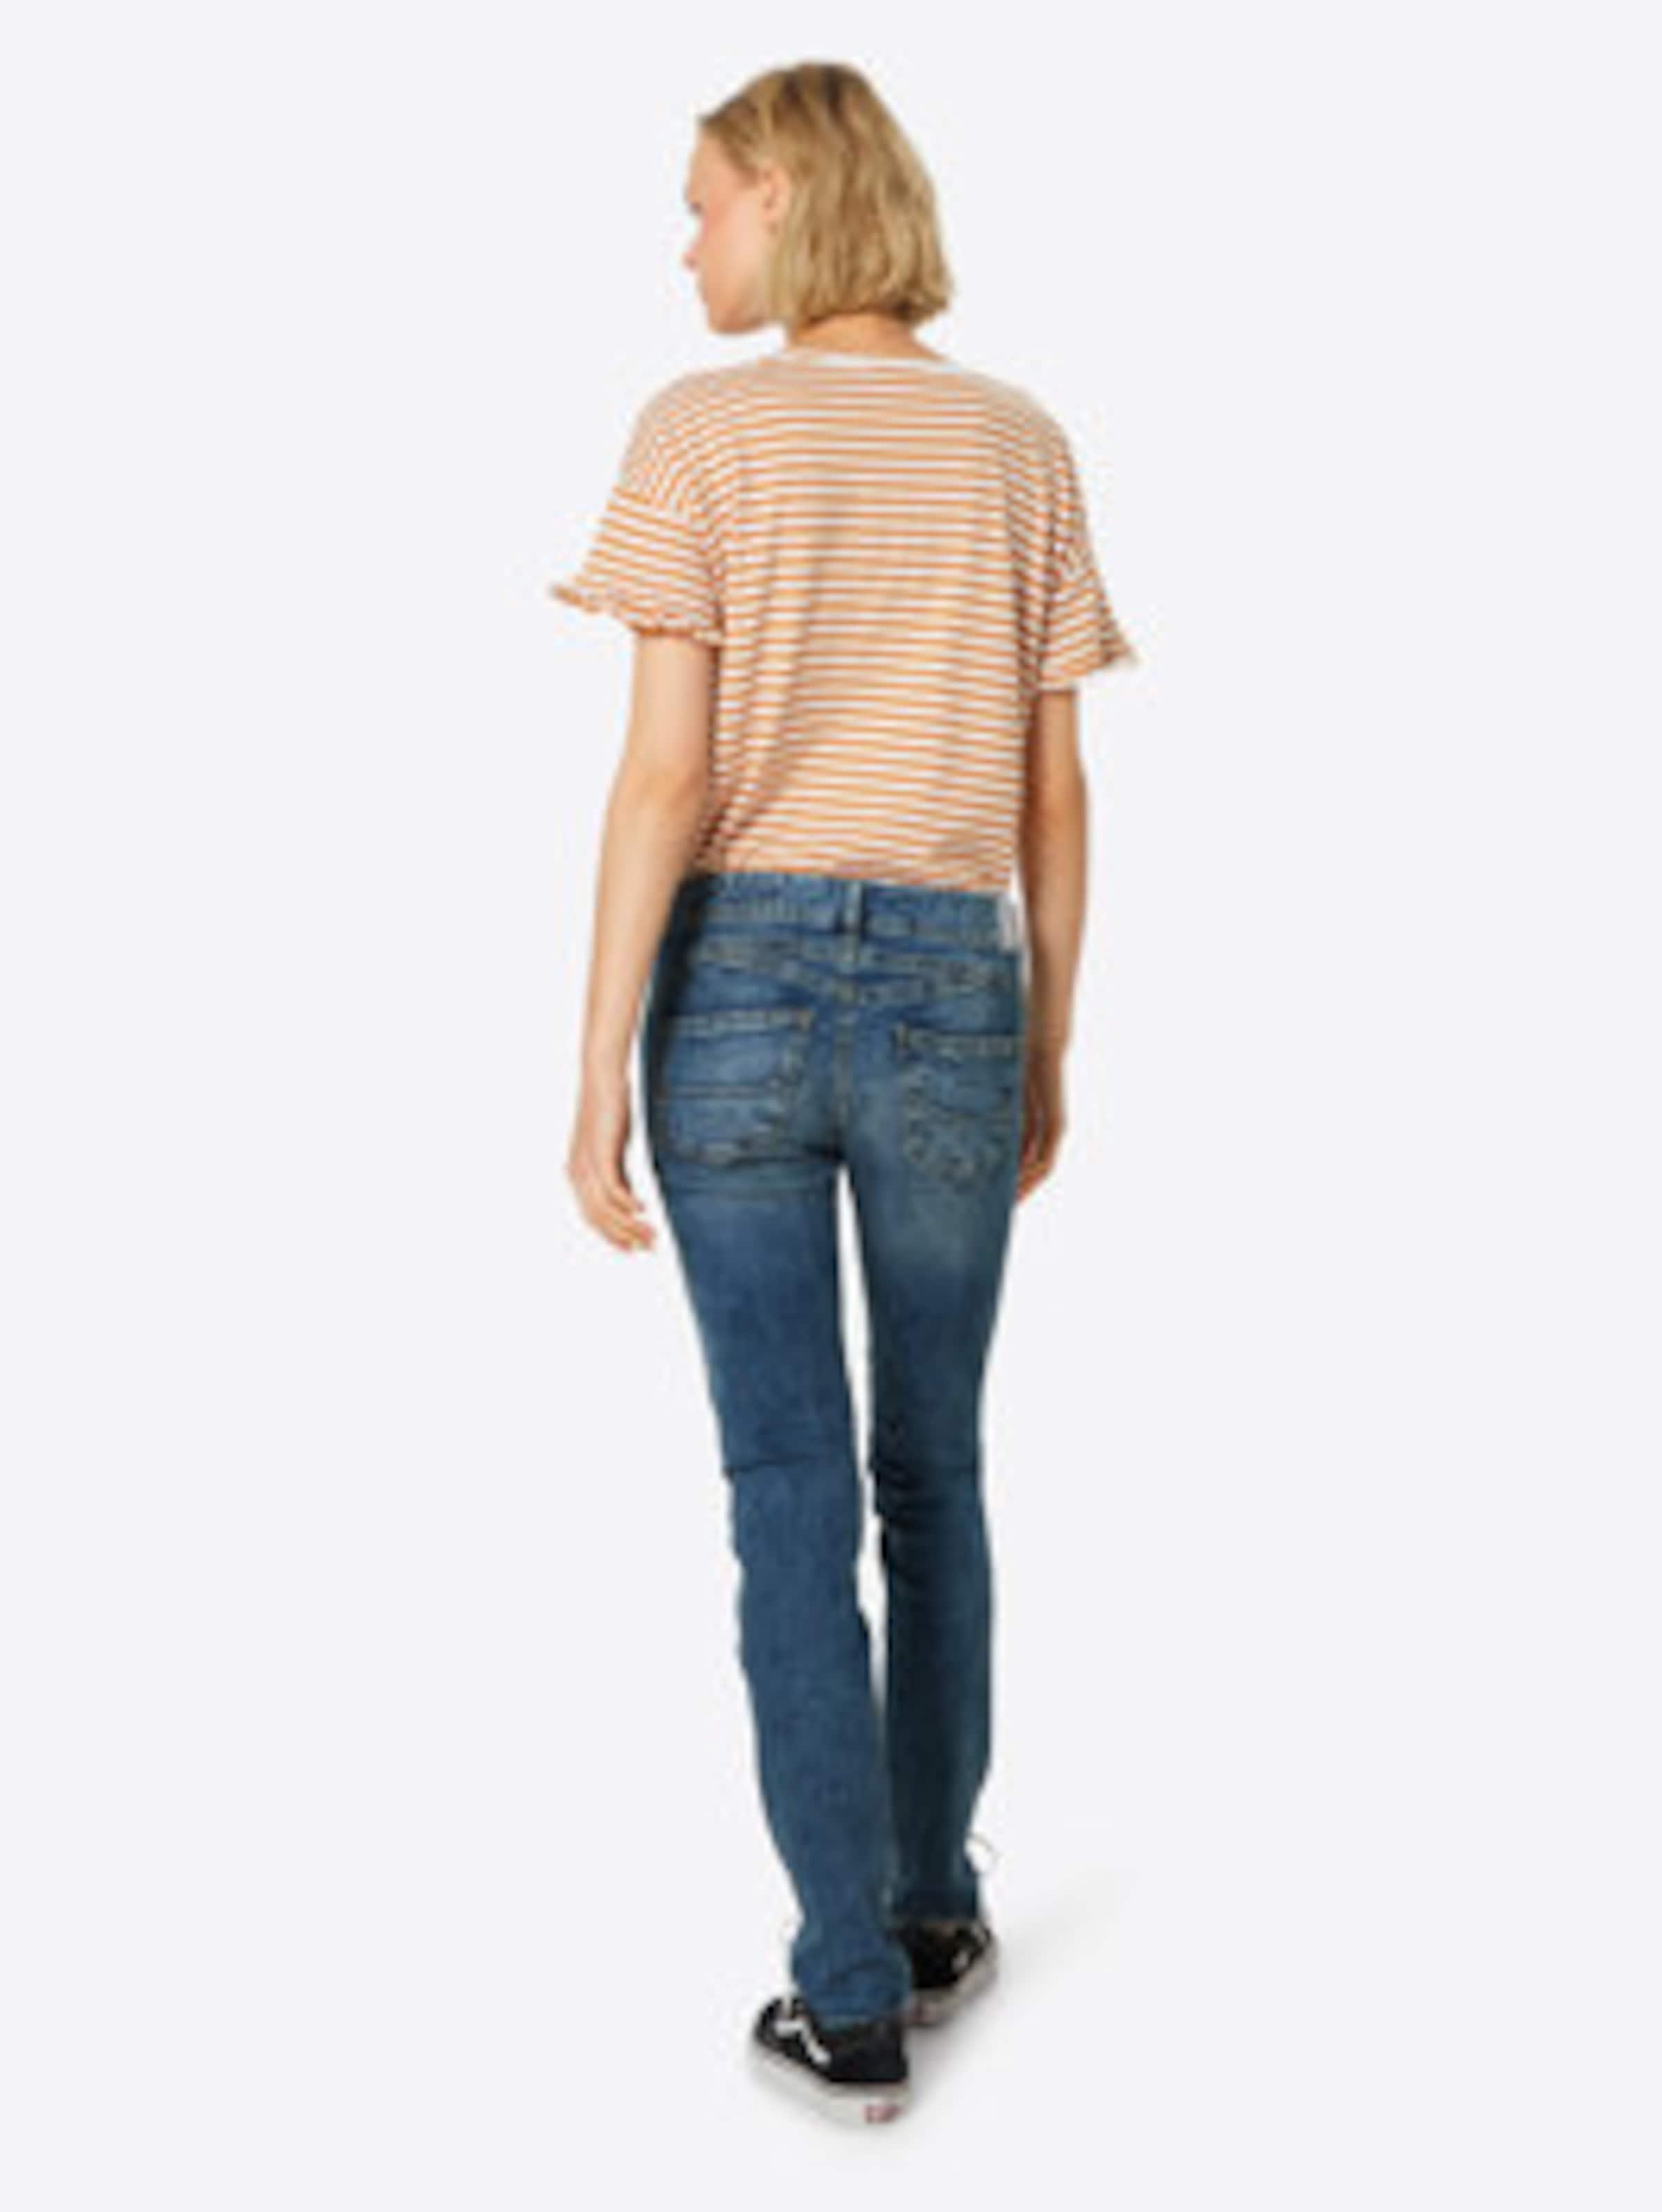 'gila' Fit In Slim Denim Jeans Herrlicher Blue wOXZkiTPlu